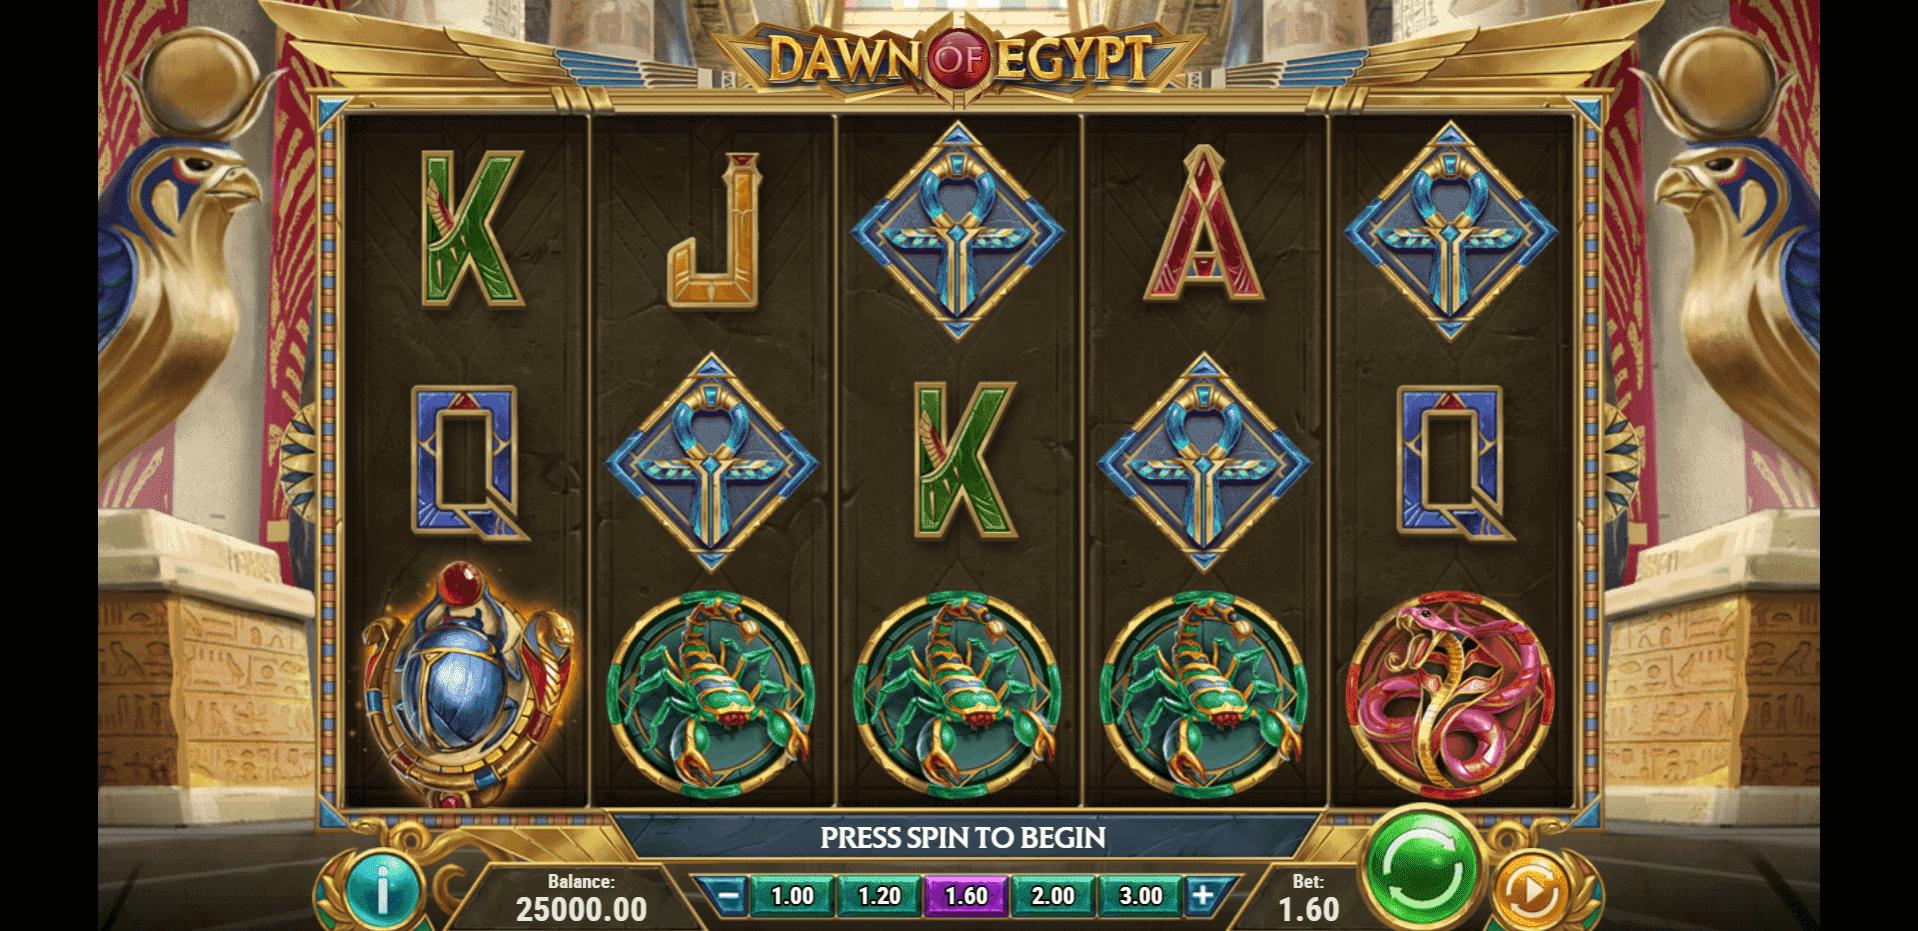 Dawn of Egypt slot machine screenshot